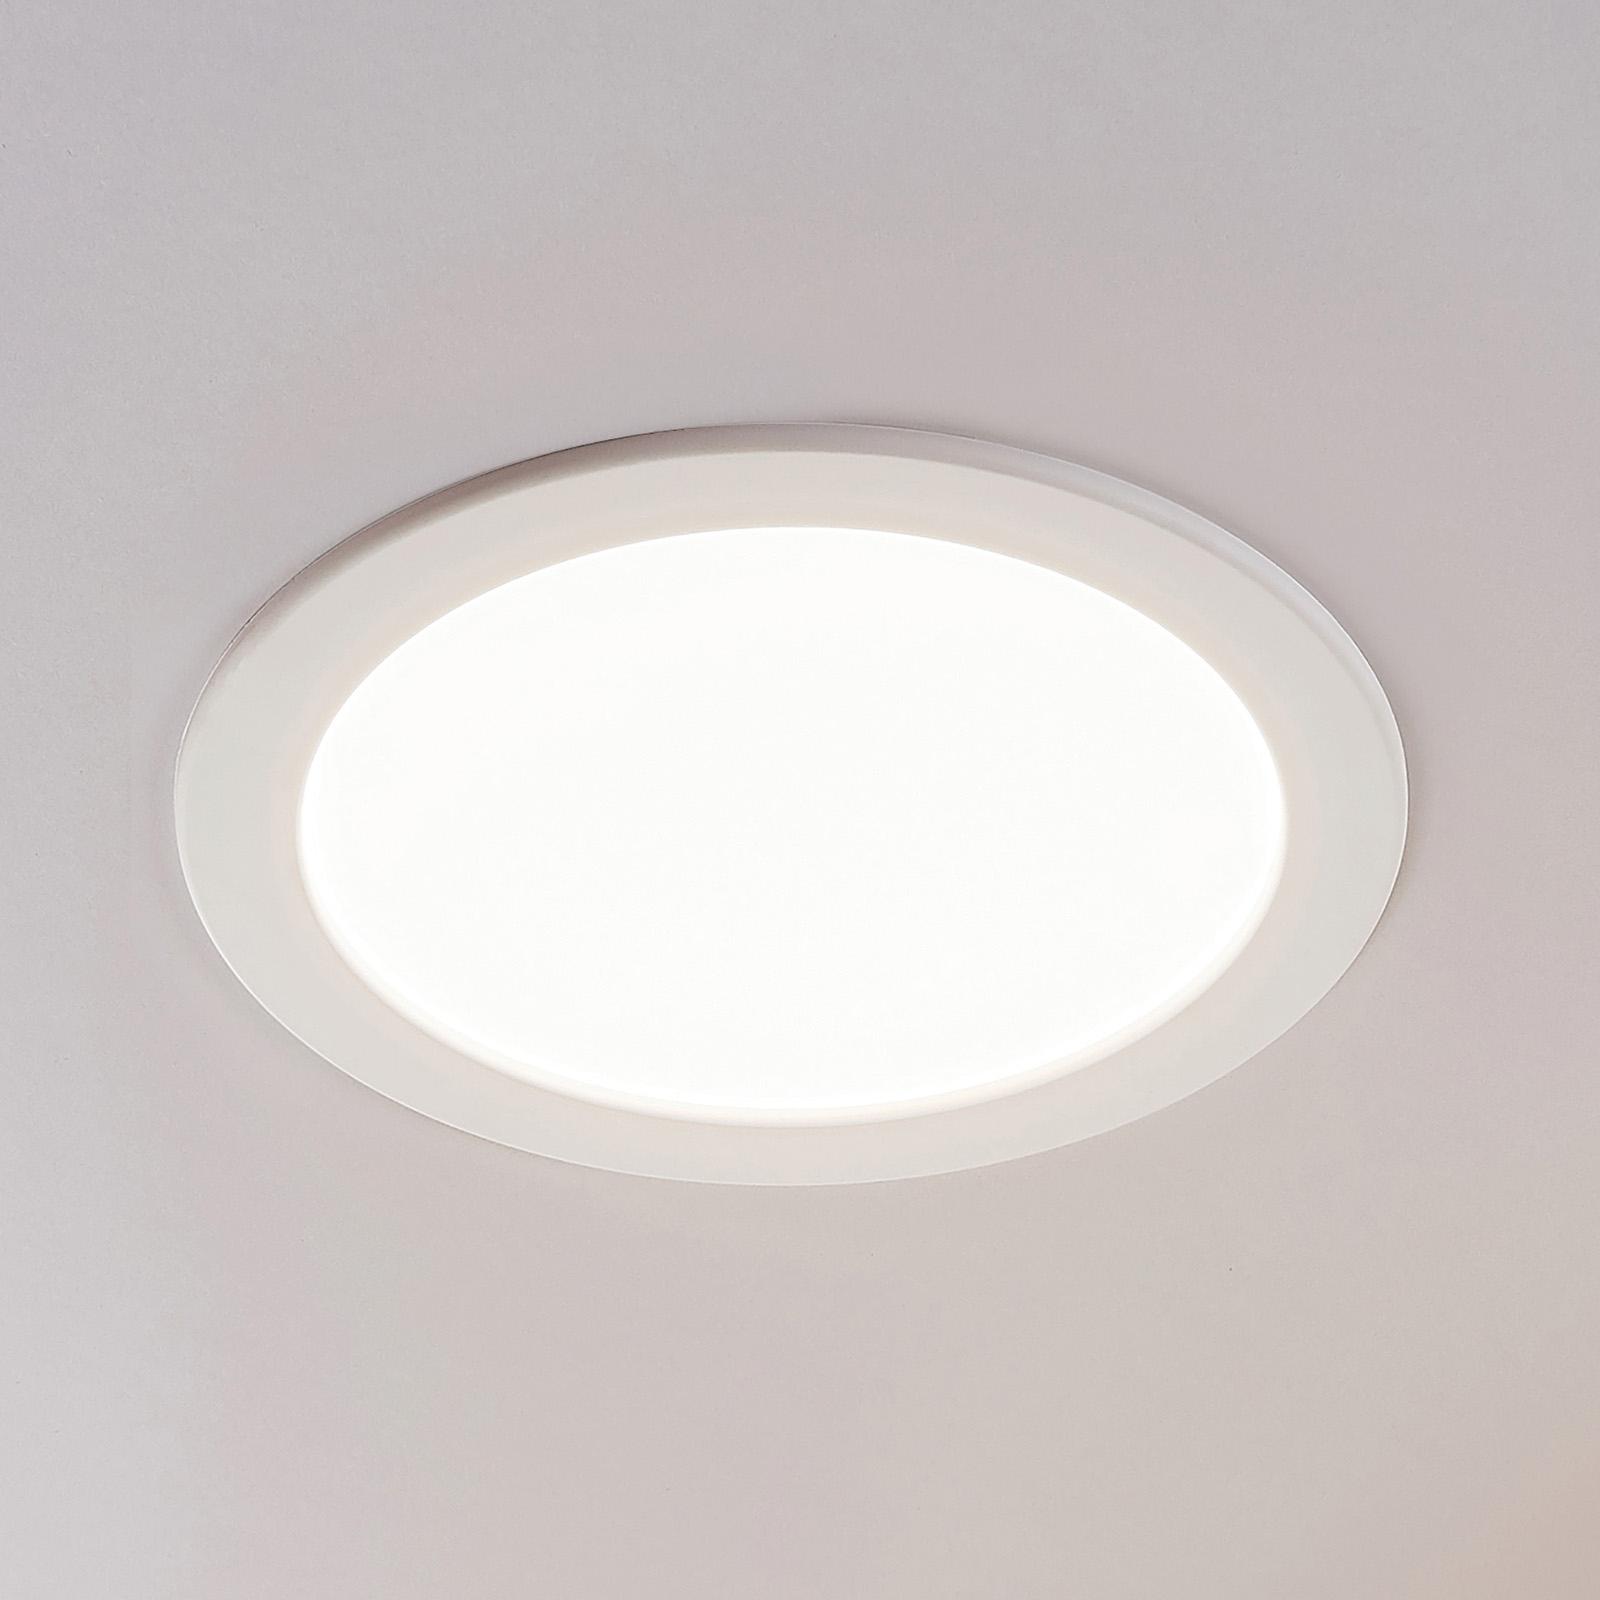 Spot encastré LED Joki blanc 3000K rond 24cm